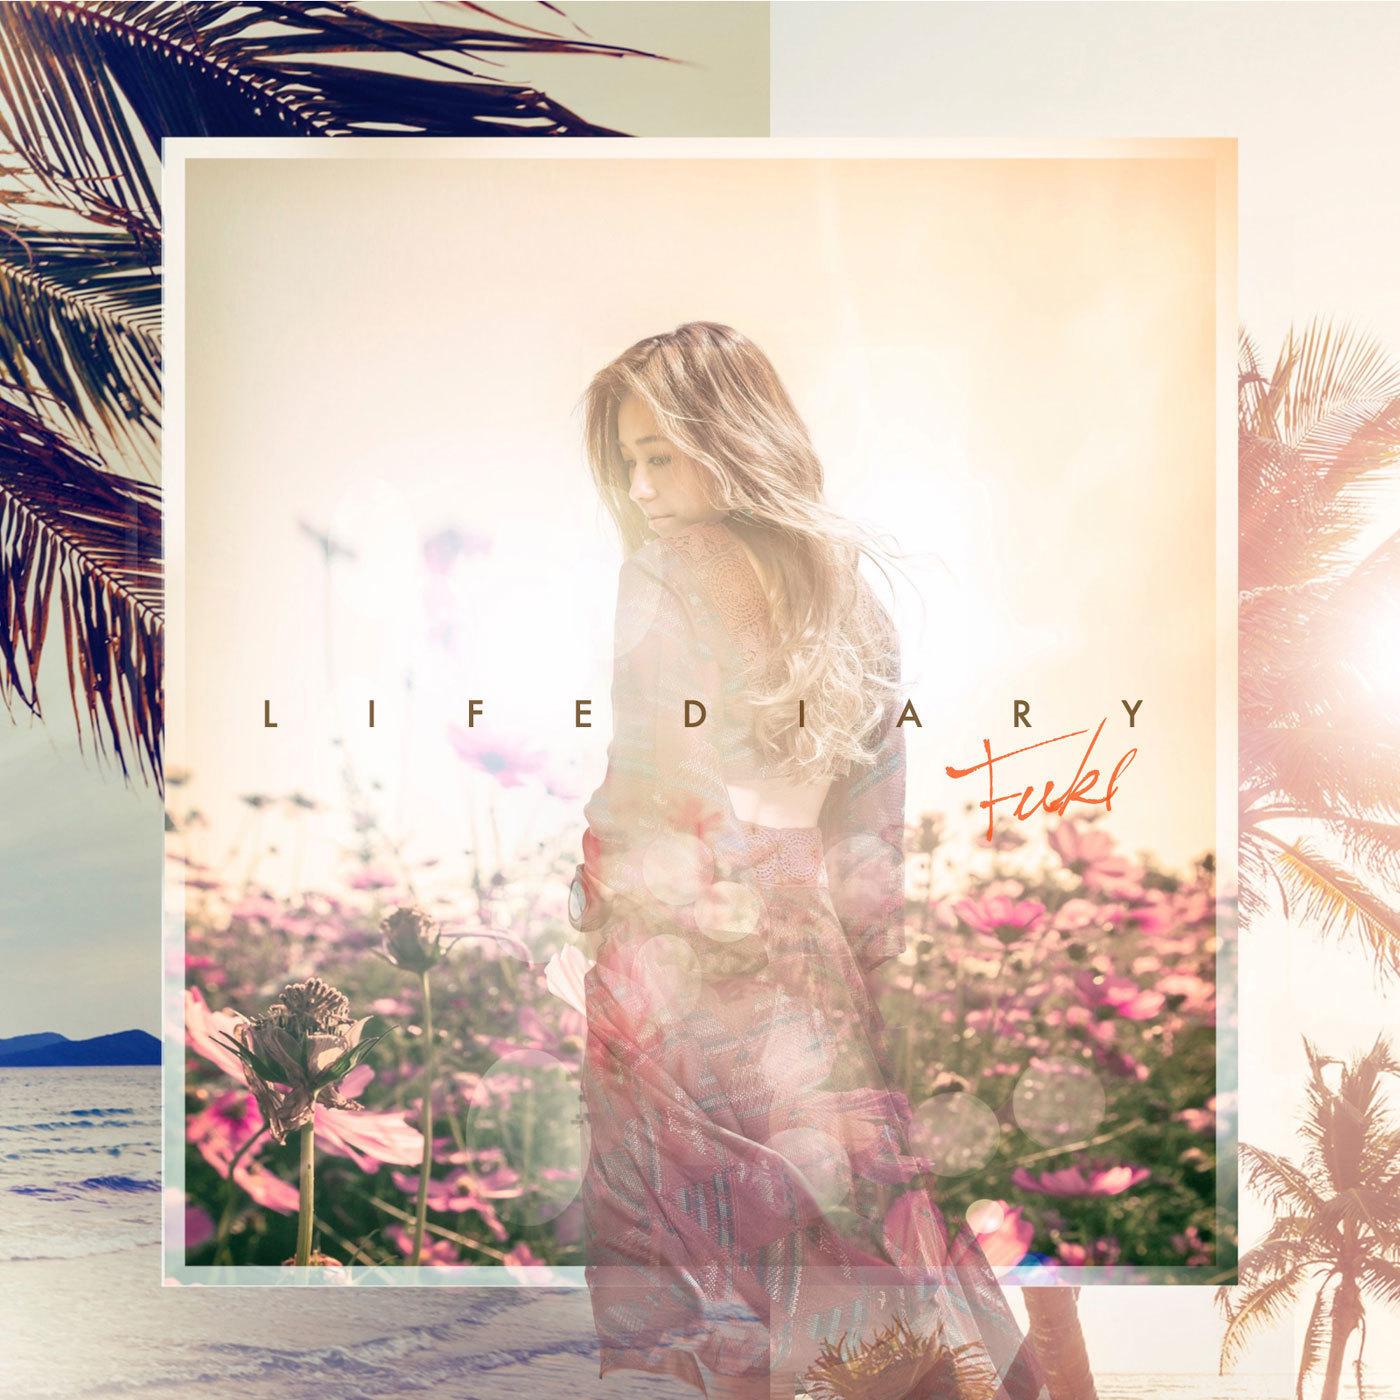 20170915.0452.3 Fuki - Life Diary cover.jpg